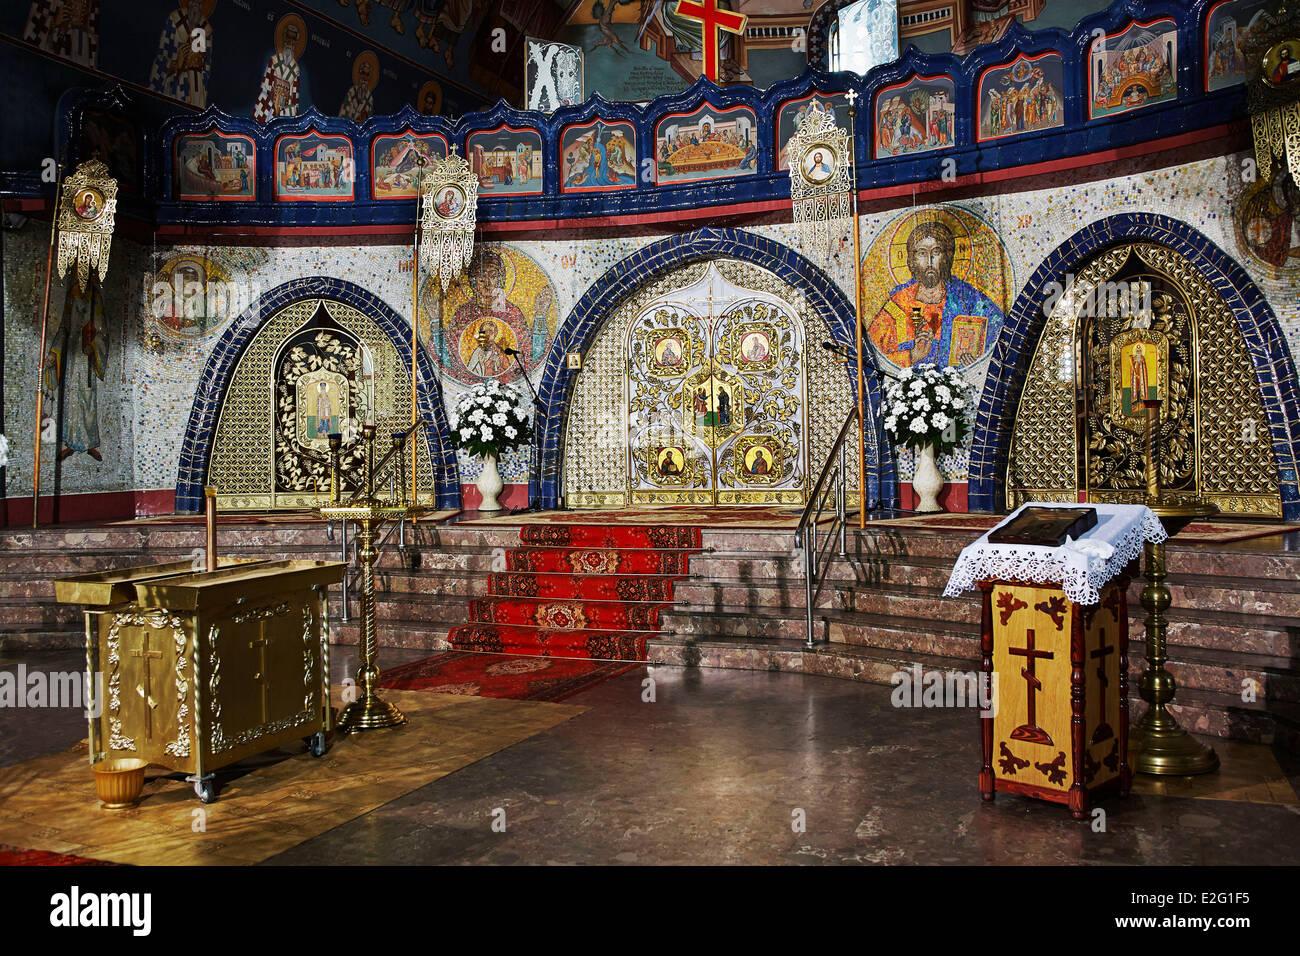 Poland Podlaskie Hajnowka inside the Holy Trinity Orthodox Church which takes place every year the internationnal - Stock Image